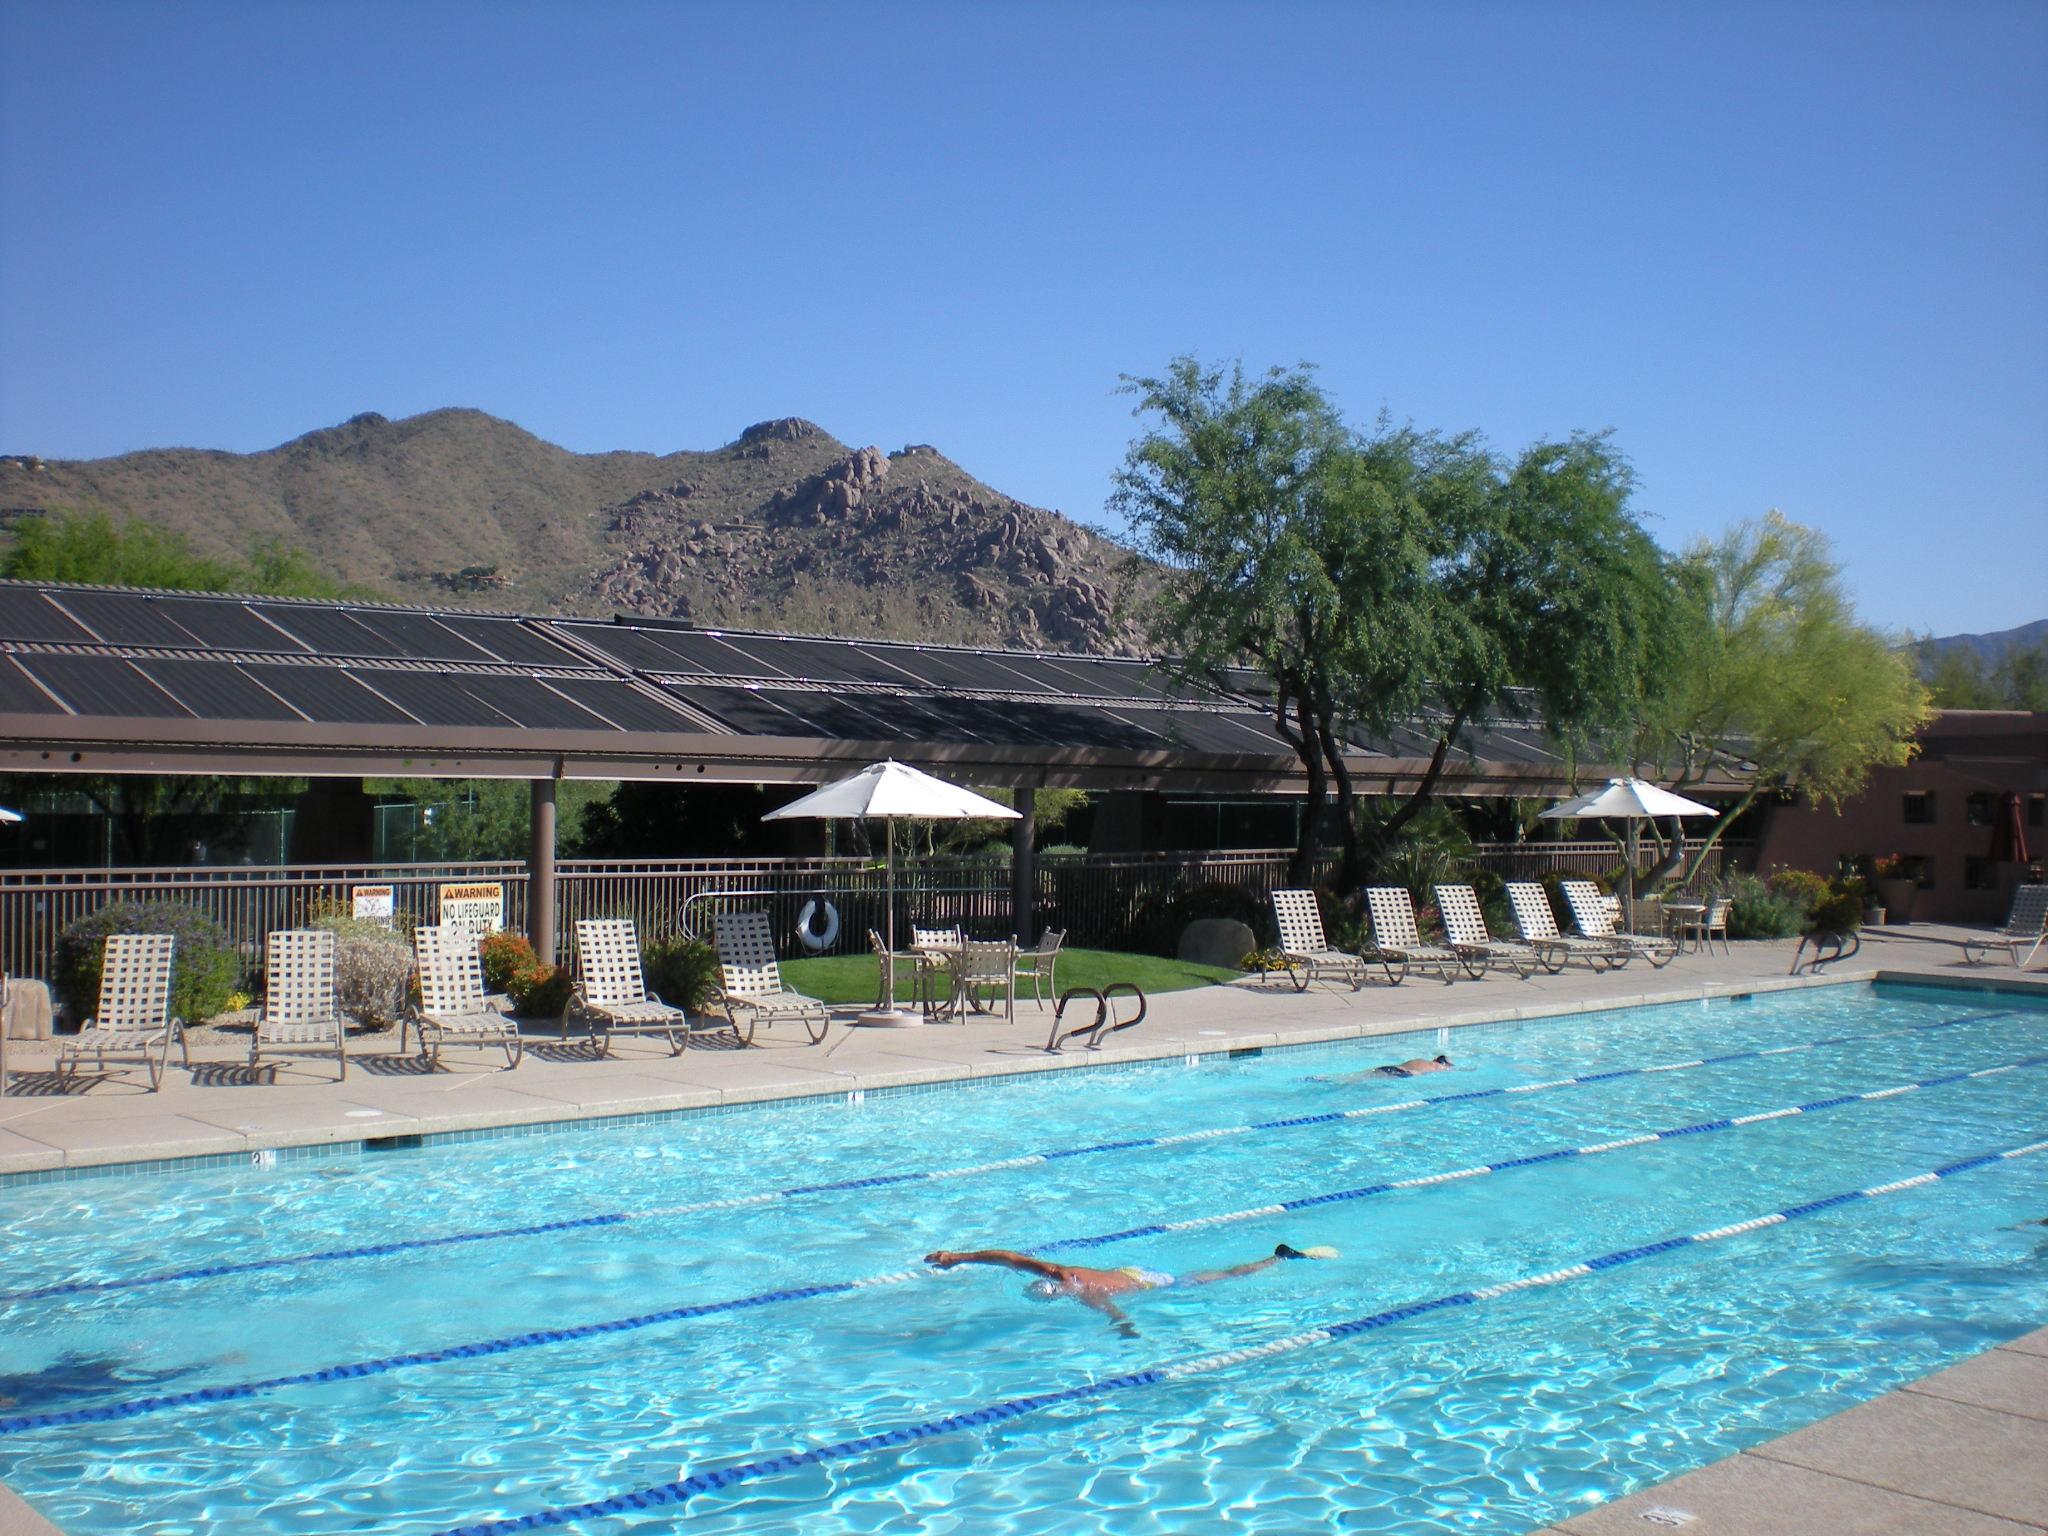 solar-thermal-hot-water-heated-pools.jpg